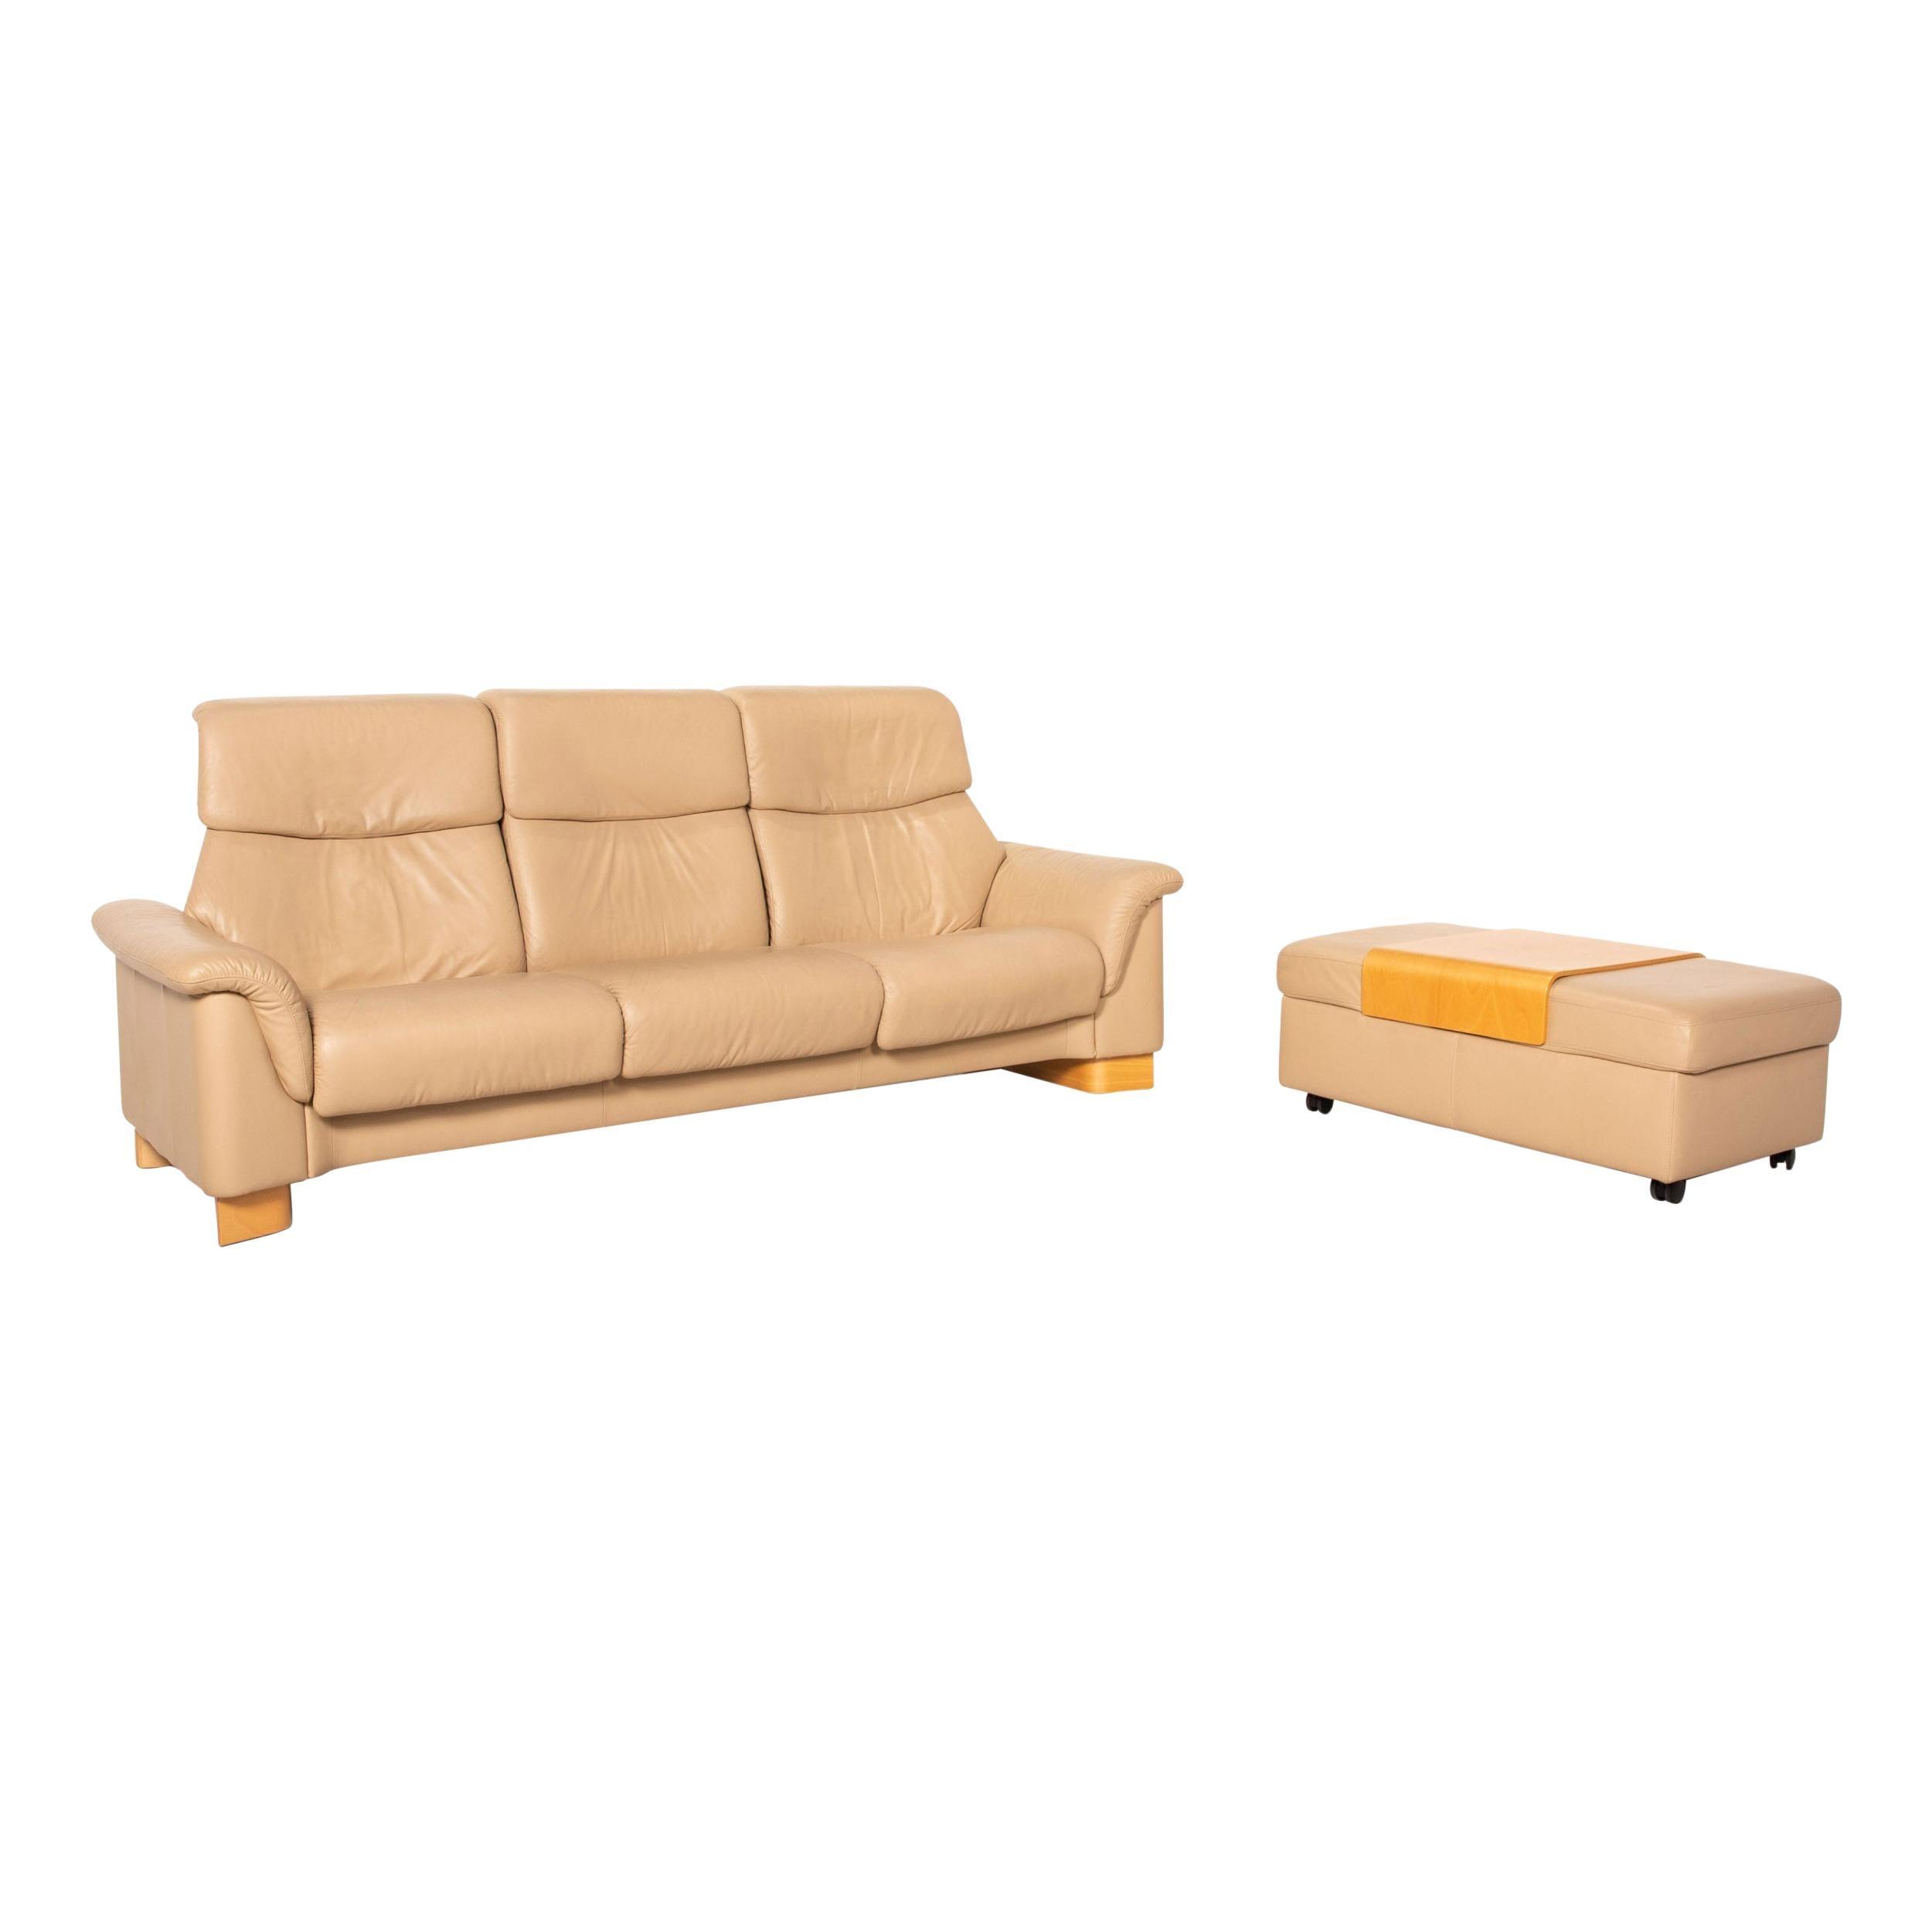 Stressless Paradise Leather Sofa Set Beige 1x Three-Seater 1x Stool